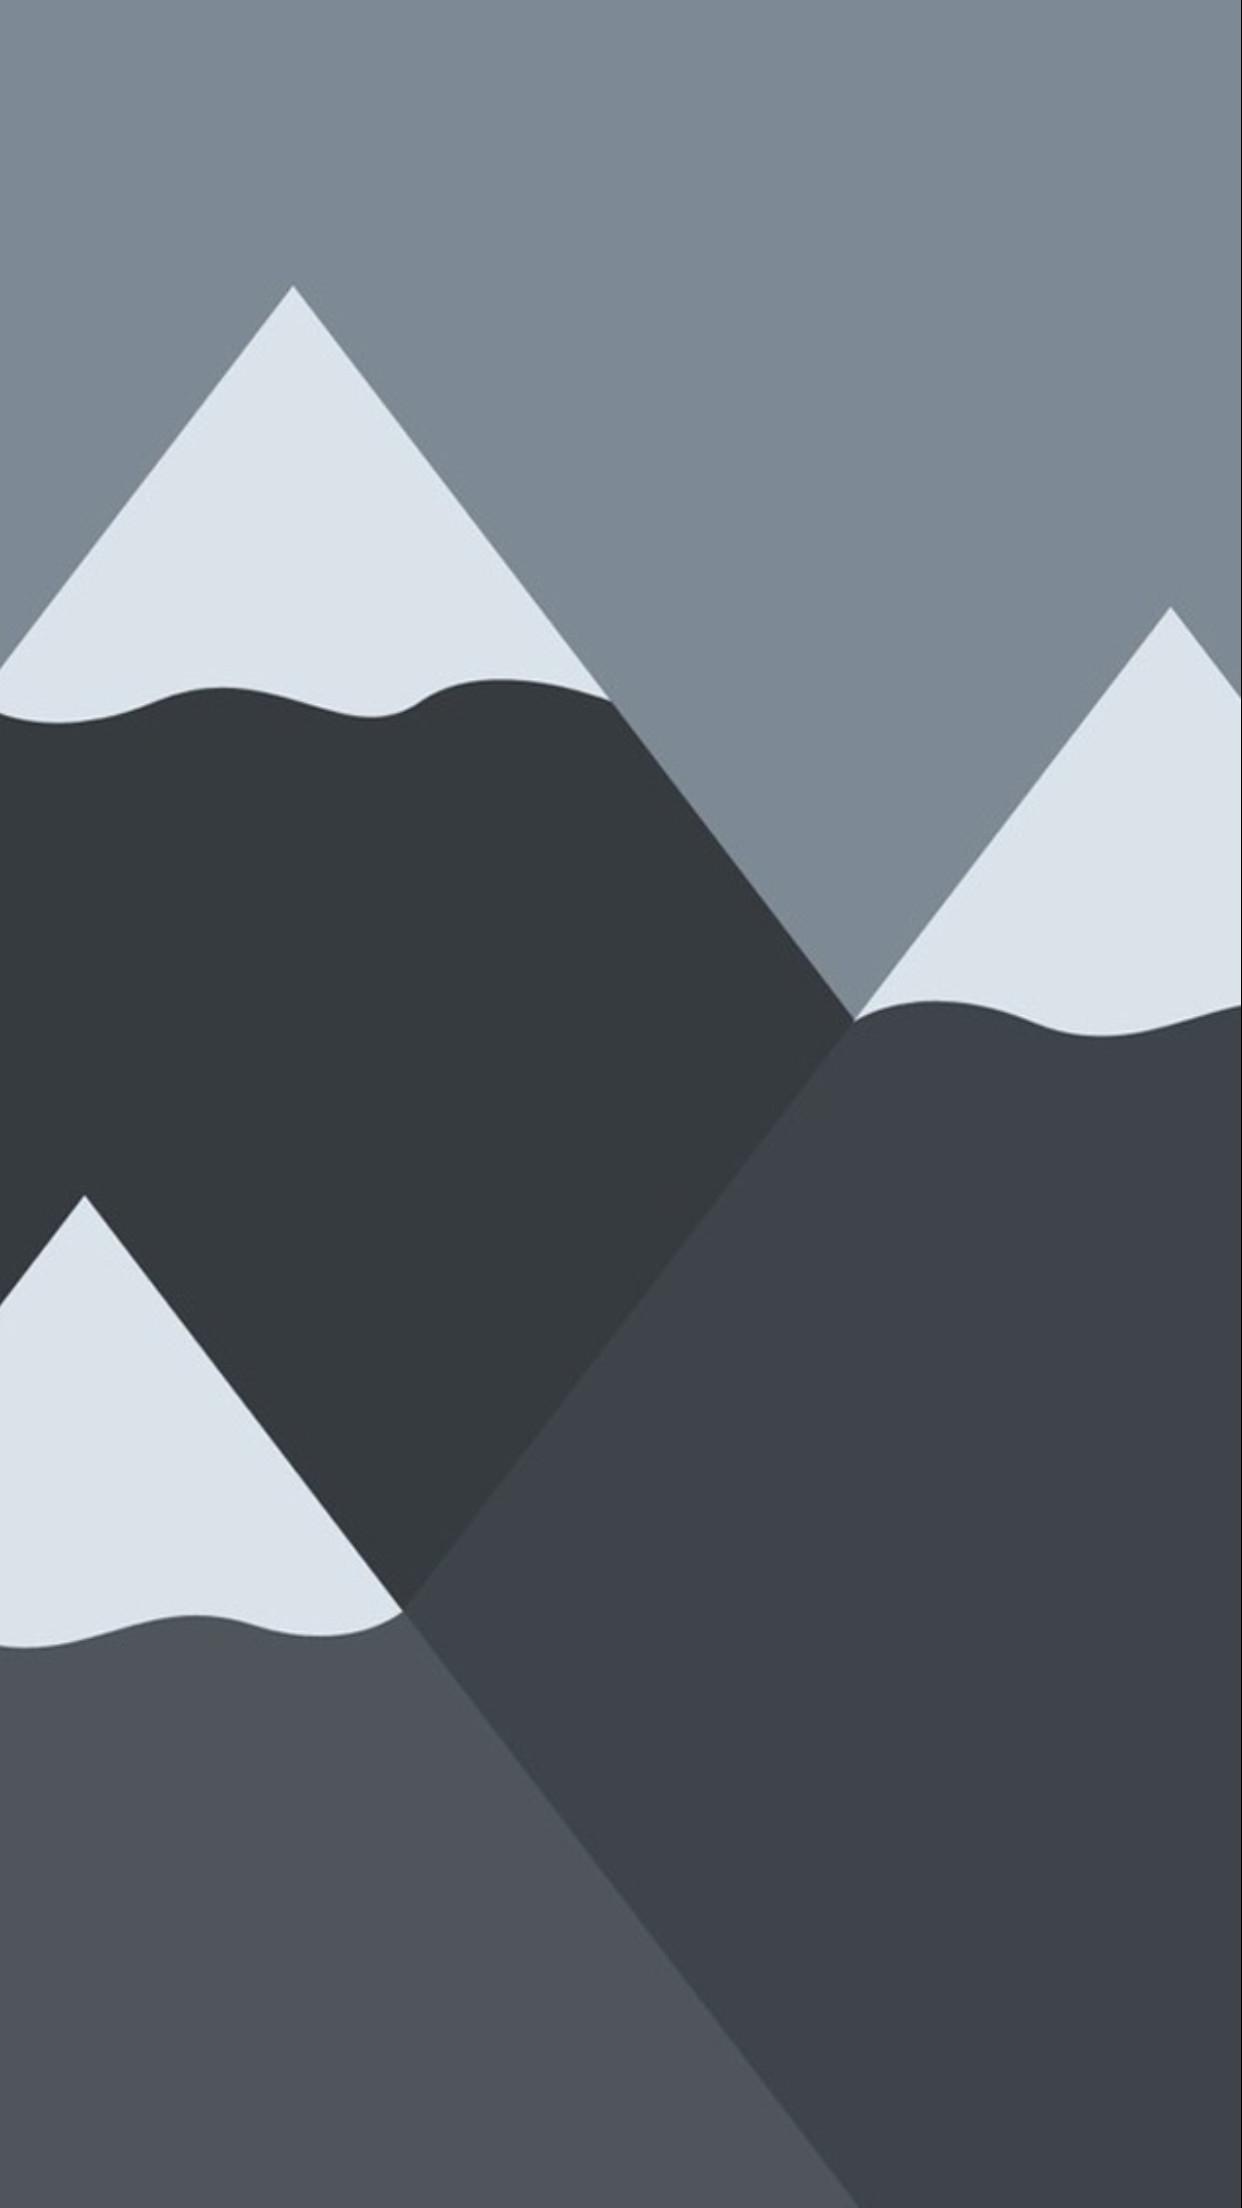 Mountains Minimal Wallpaper iPhone 6 Plus. Black shapes